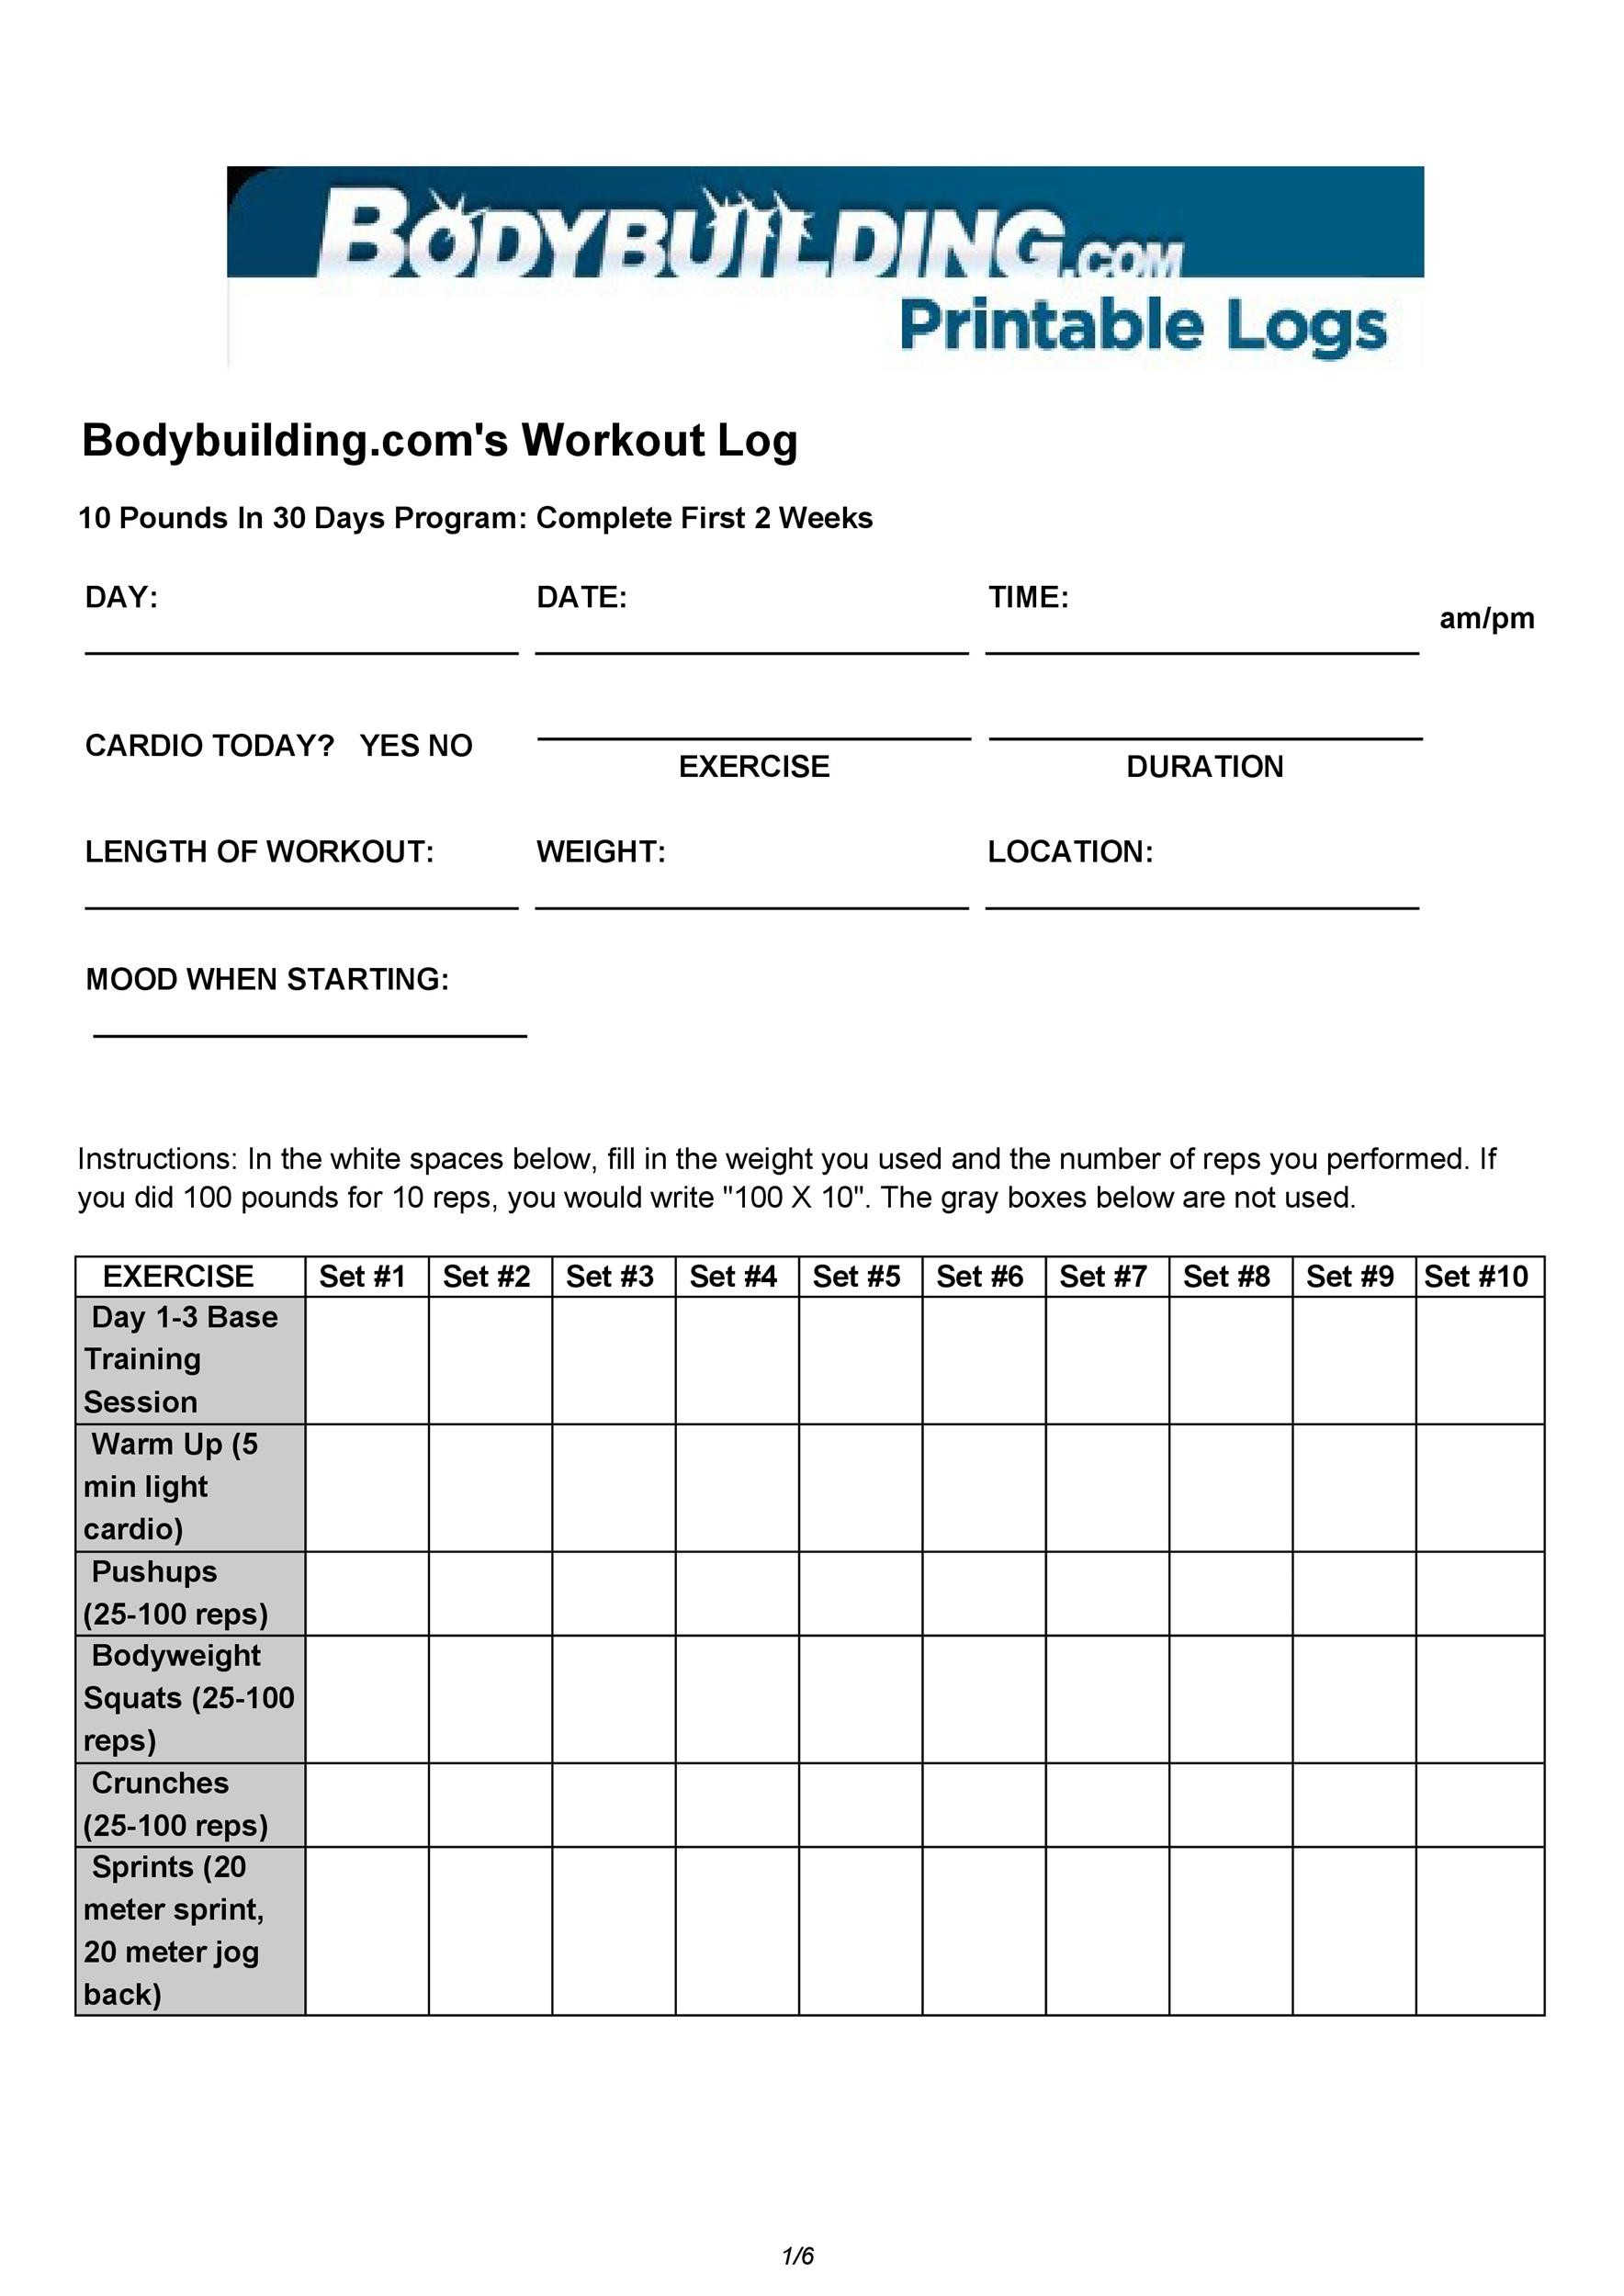 bodybuilding printable logs